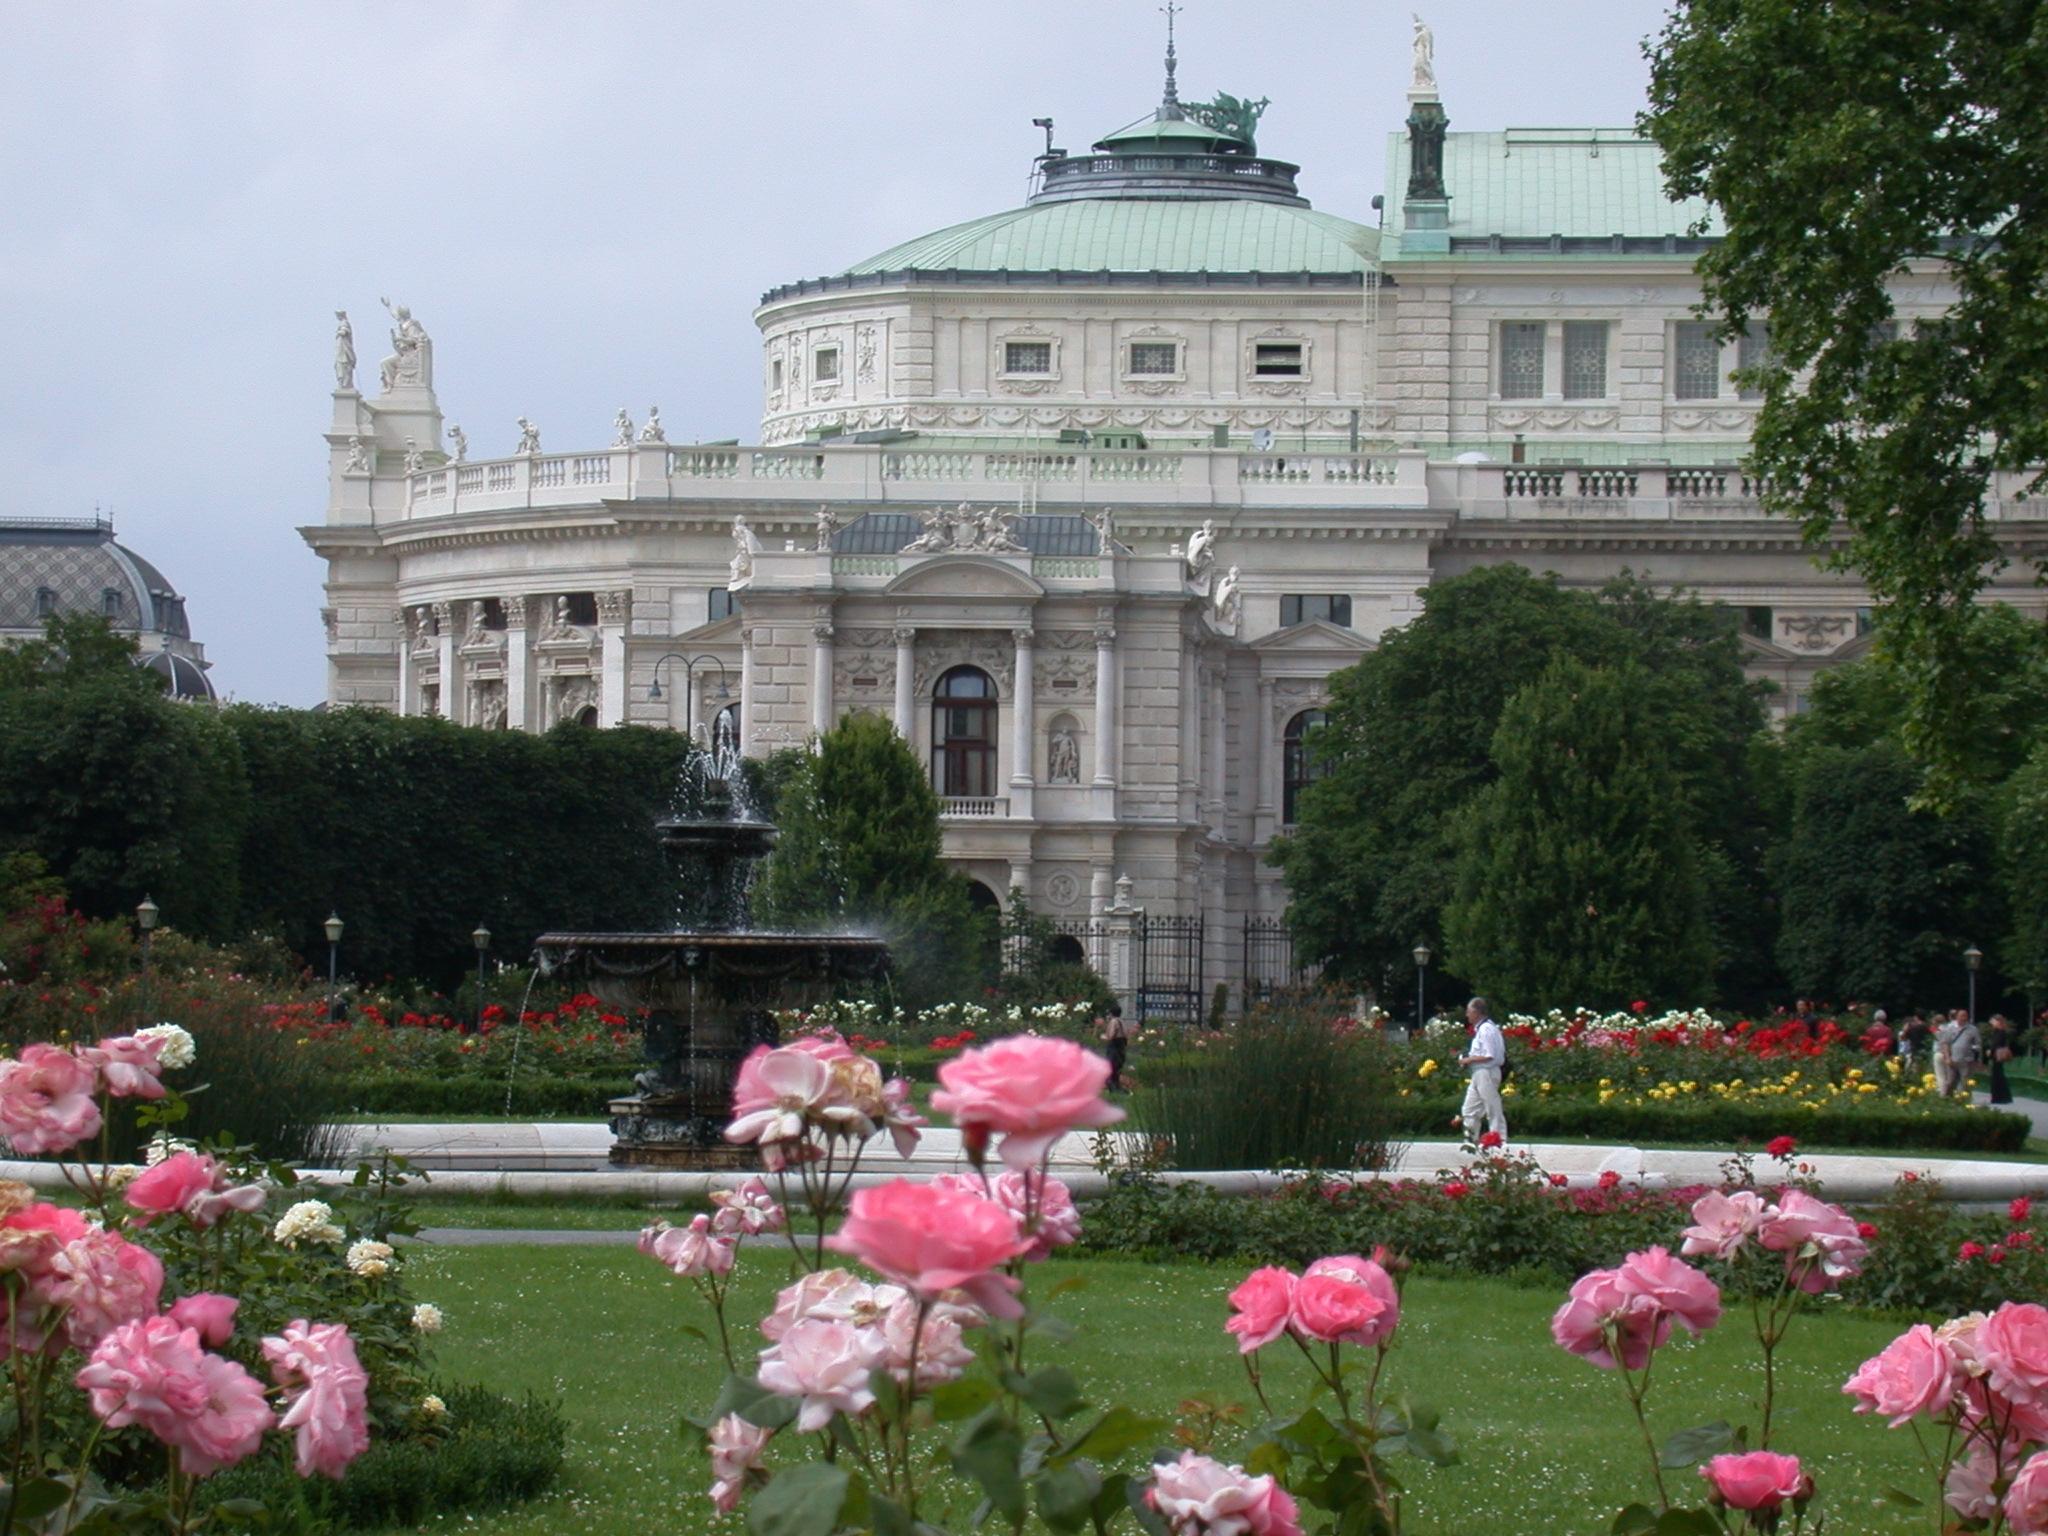 Burg Theater